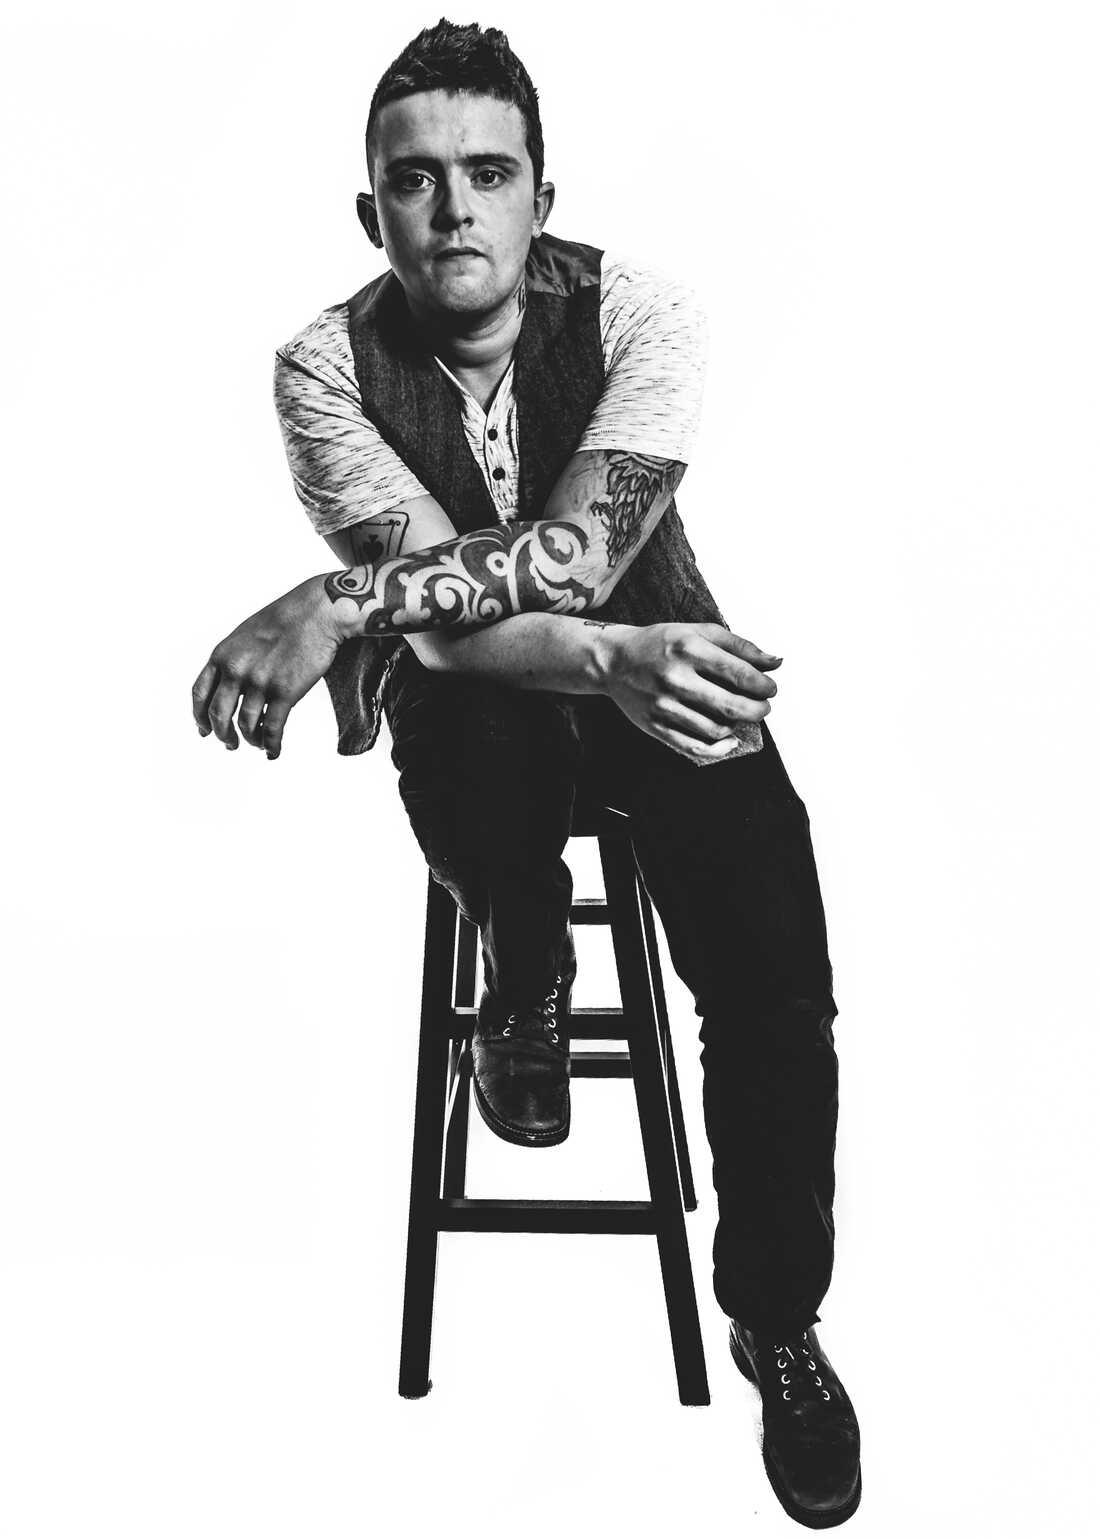 Singer Christopher Denny